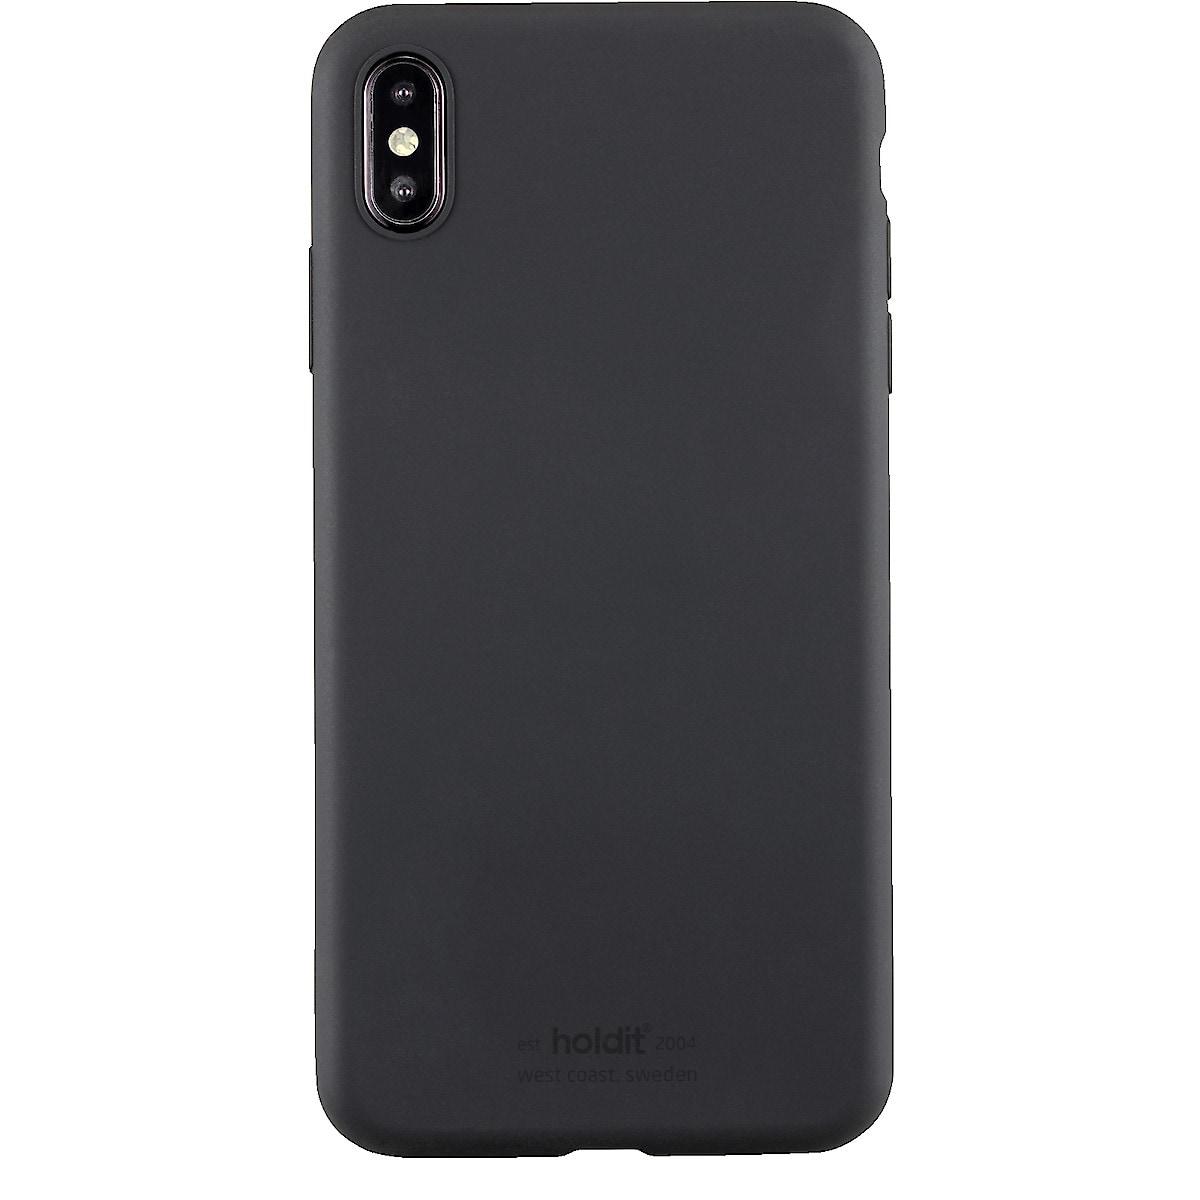 Mobilskal i silikon för iPhone Xs Max Holdit